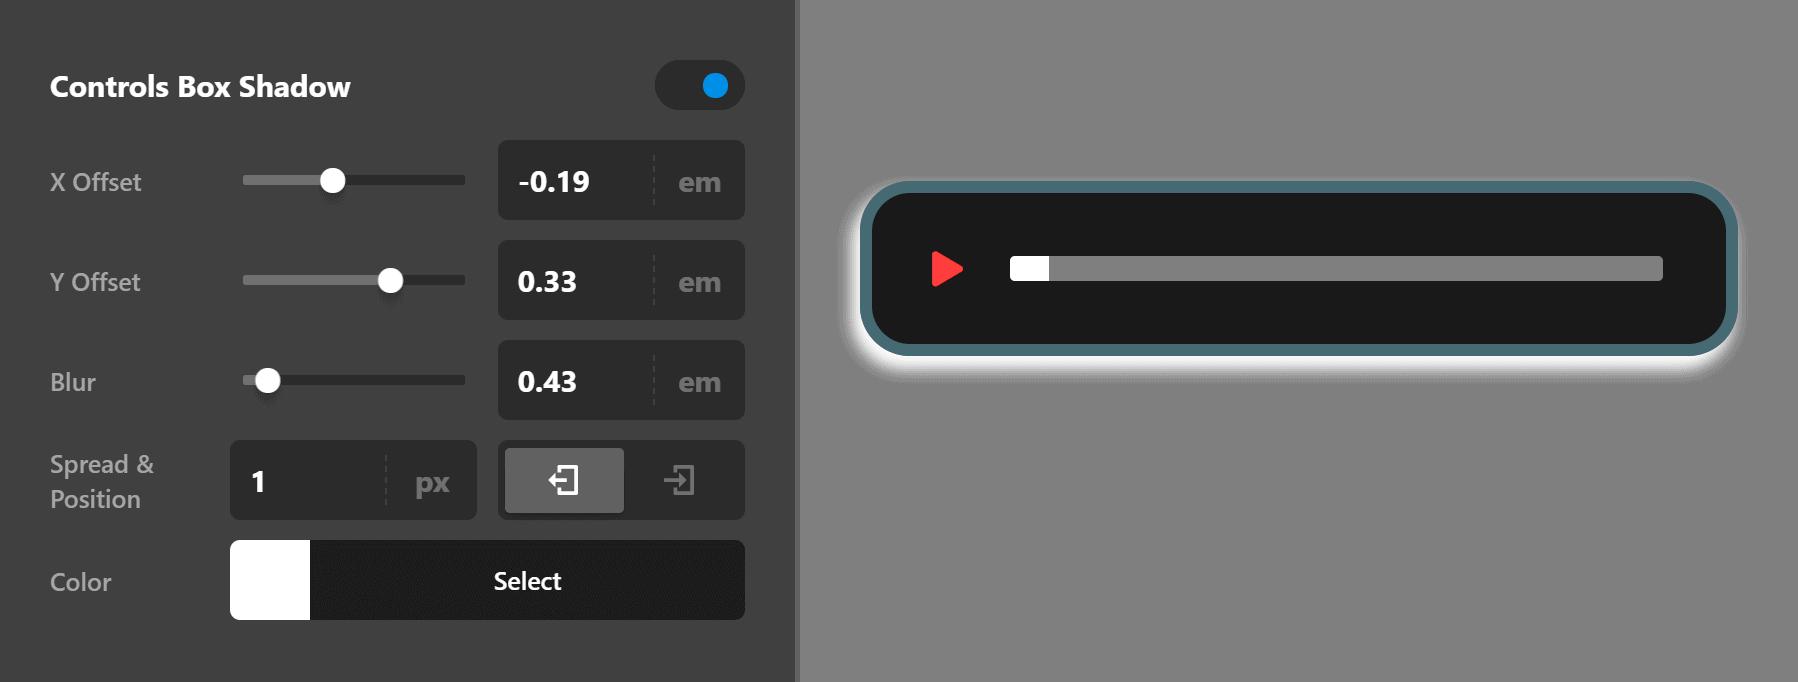 Audio Controls Box Shadow